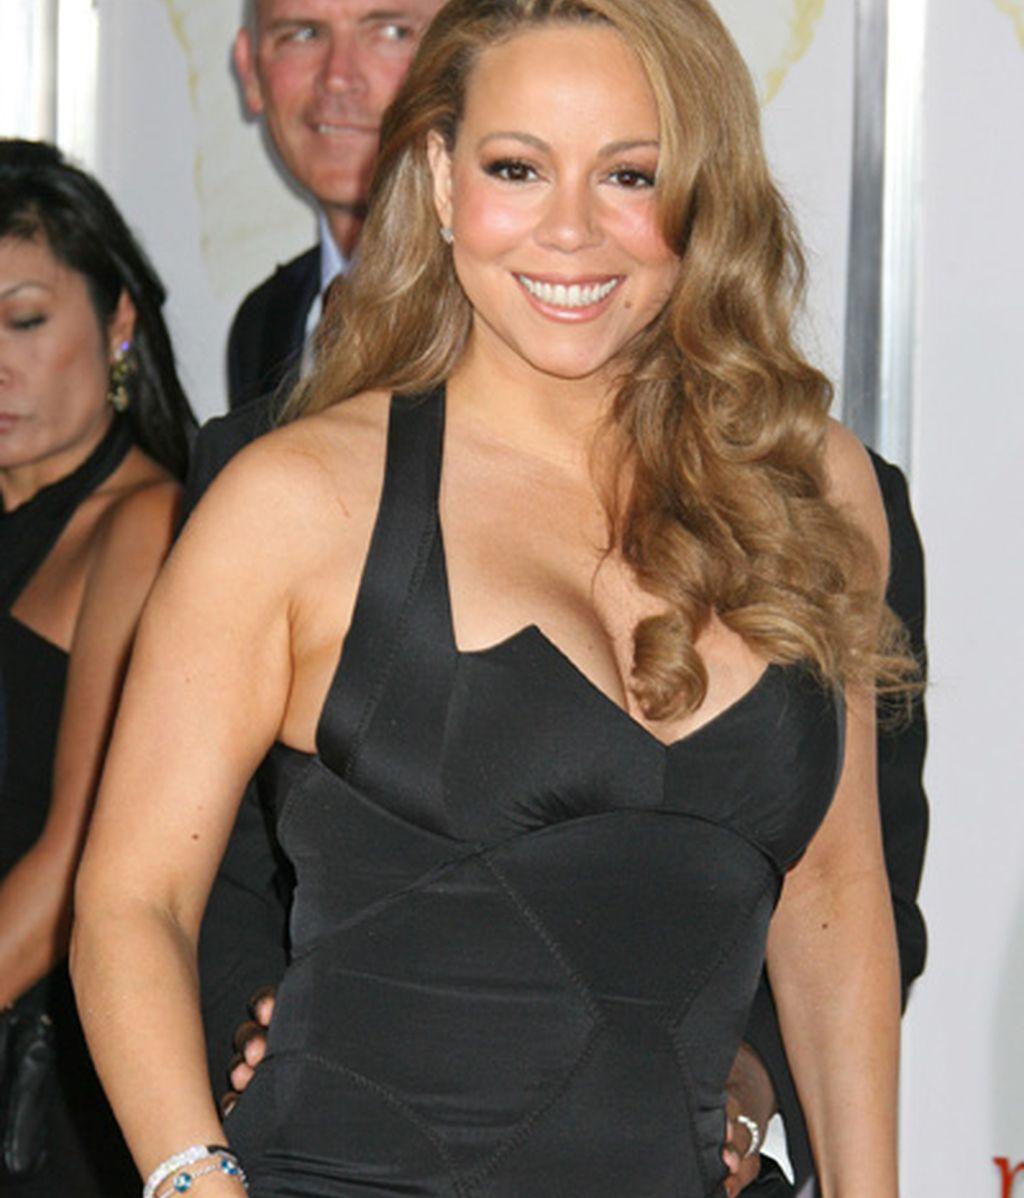 7. Mariah Carey